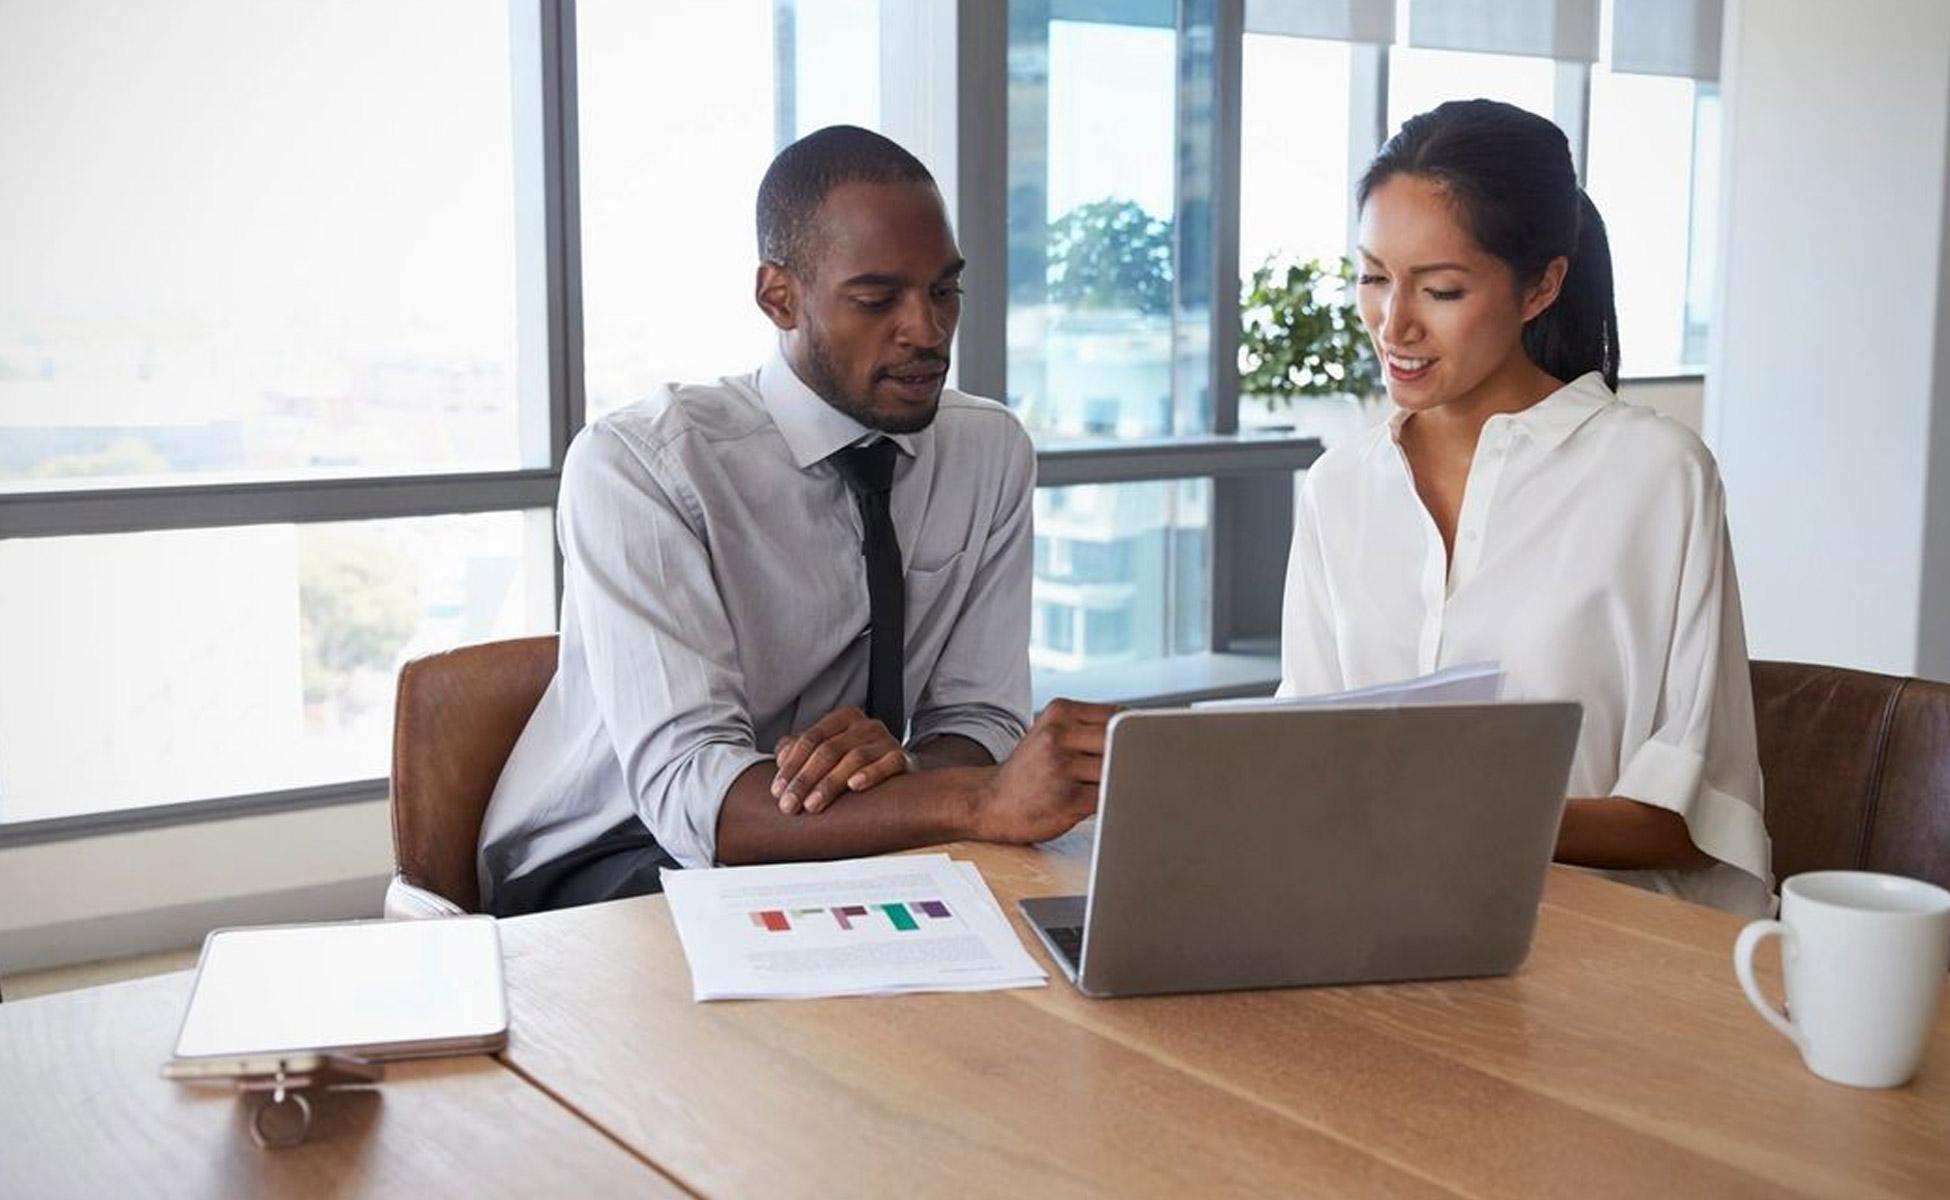 LA Smart Home WIFI and Networking Los Angeles California